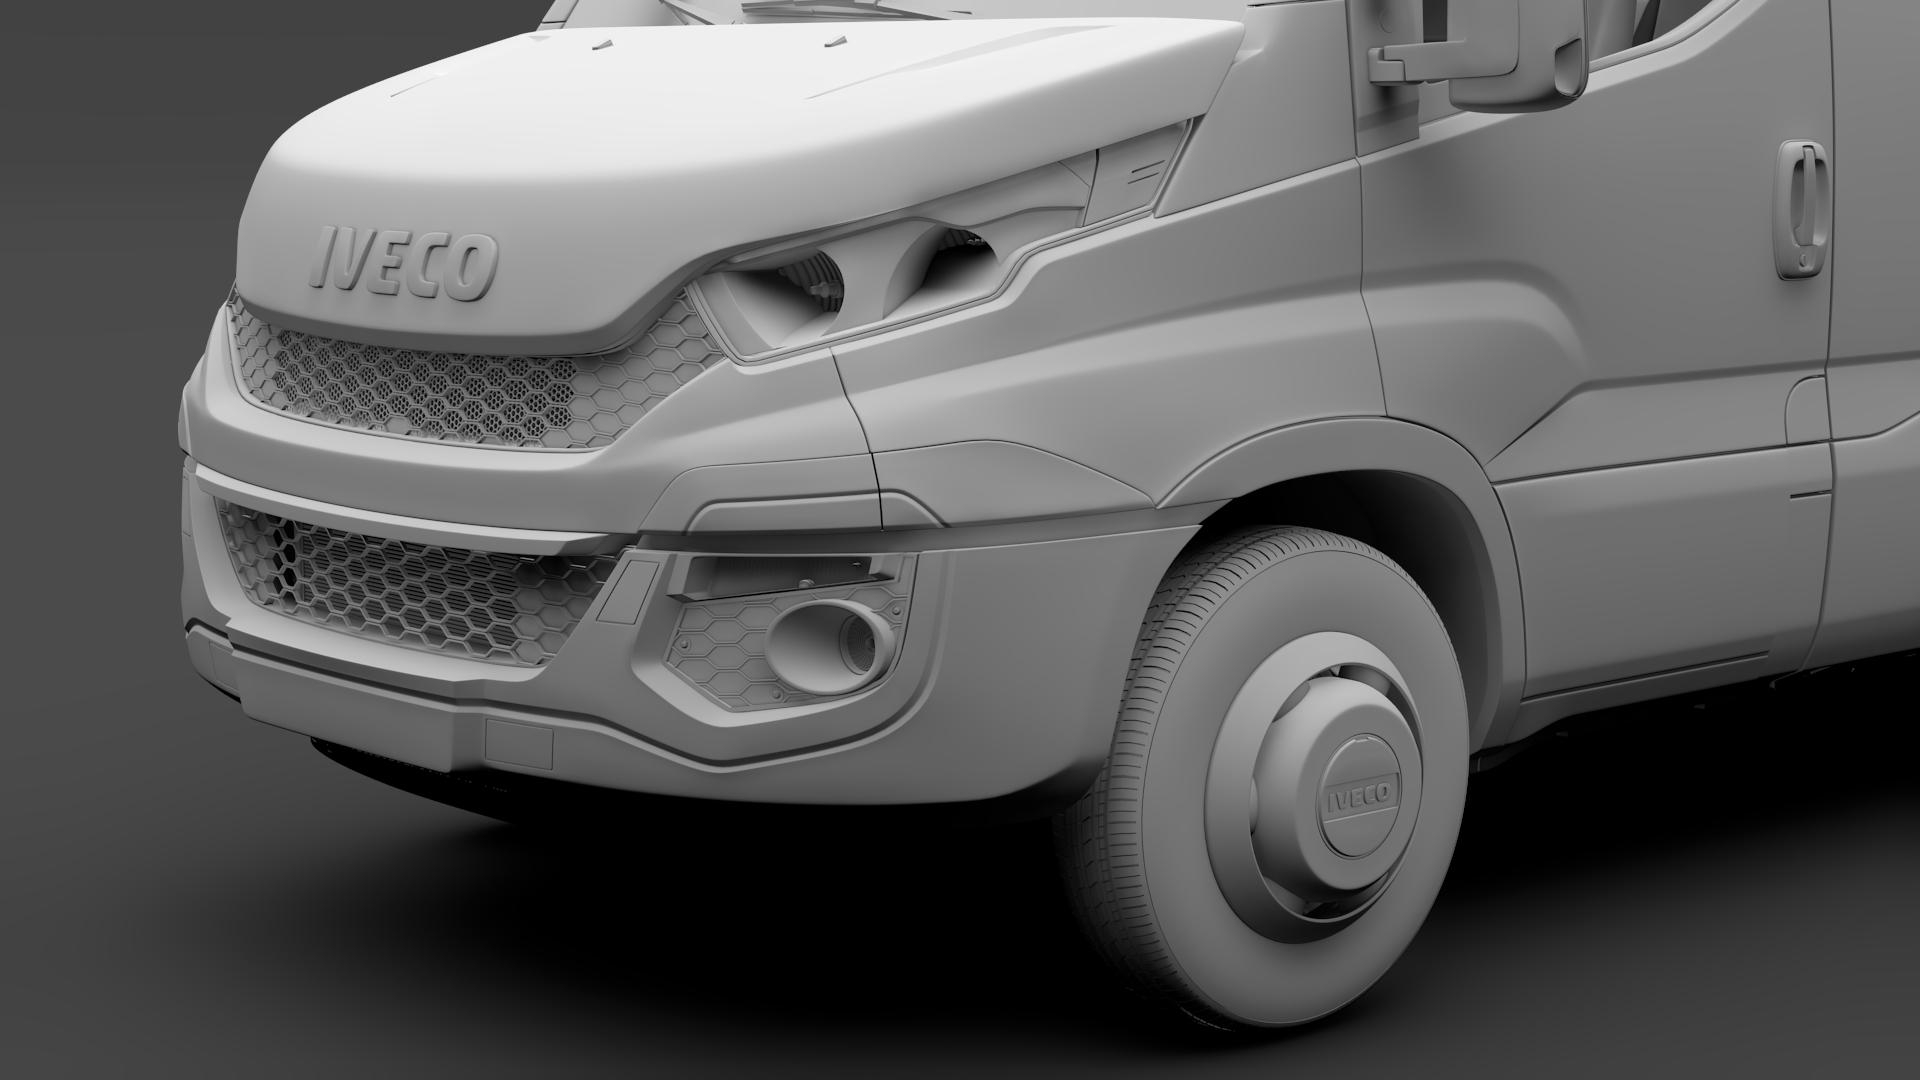 iveco daily minibus l3h2 2014-2016 3d model max fbx c4d lwo ma mb hrc xsi obj 276051